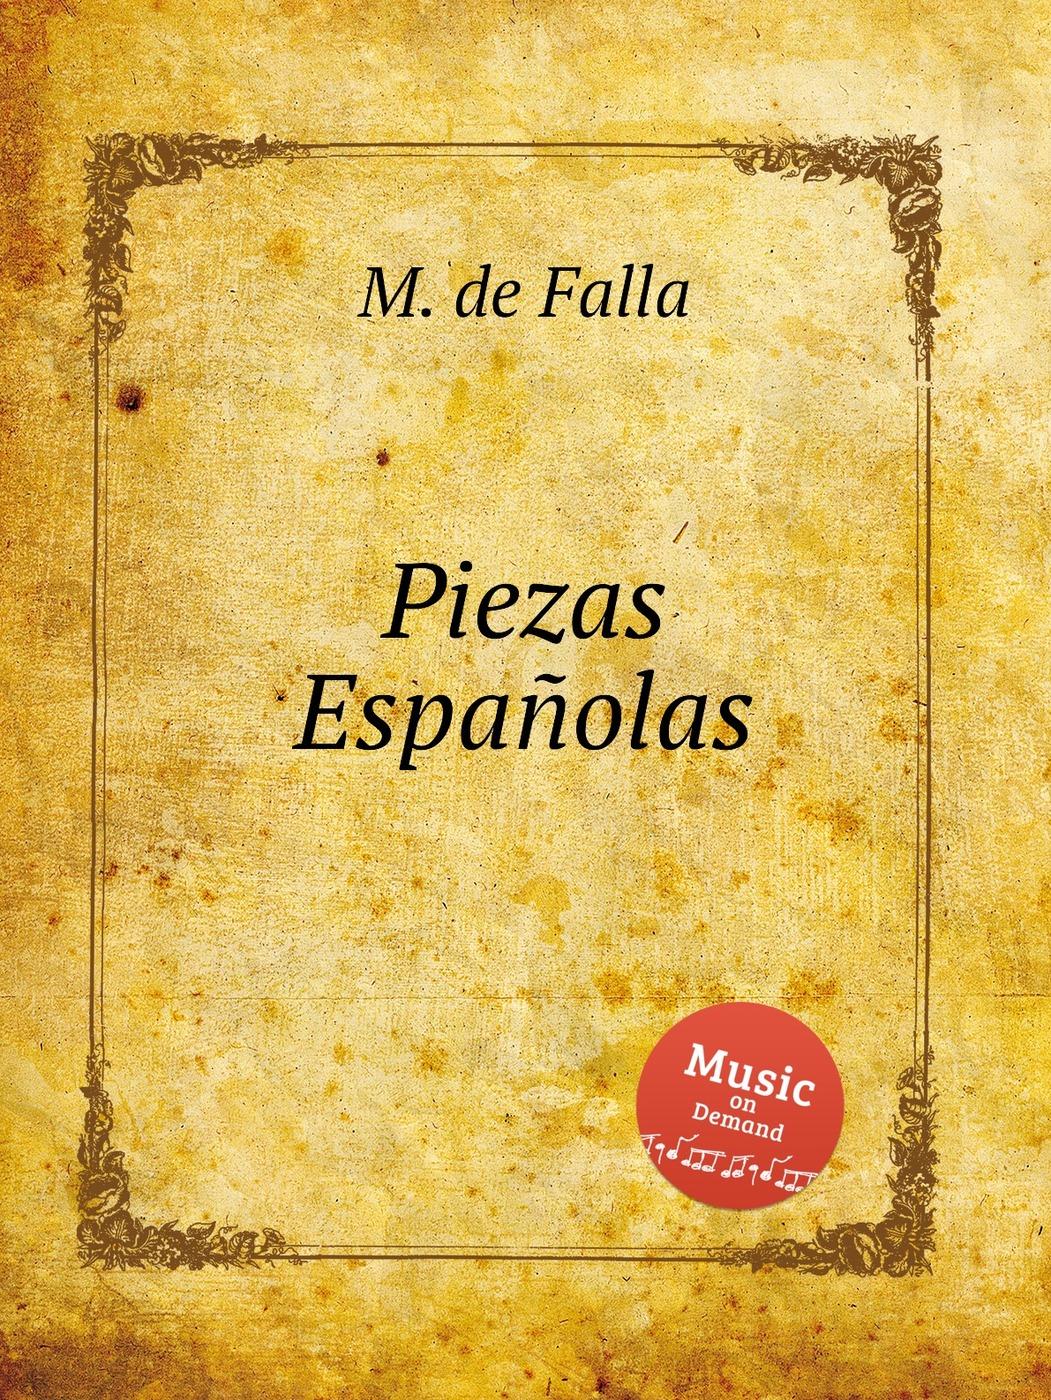 Piezas Espanolas 9785884599888